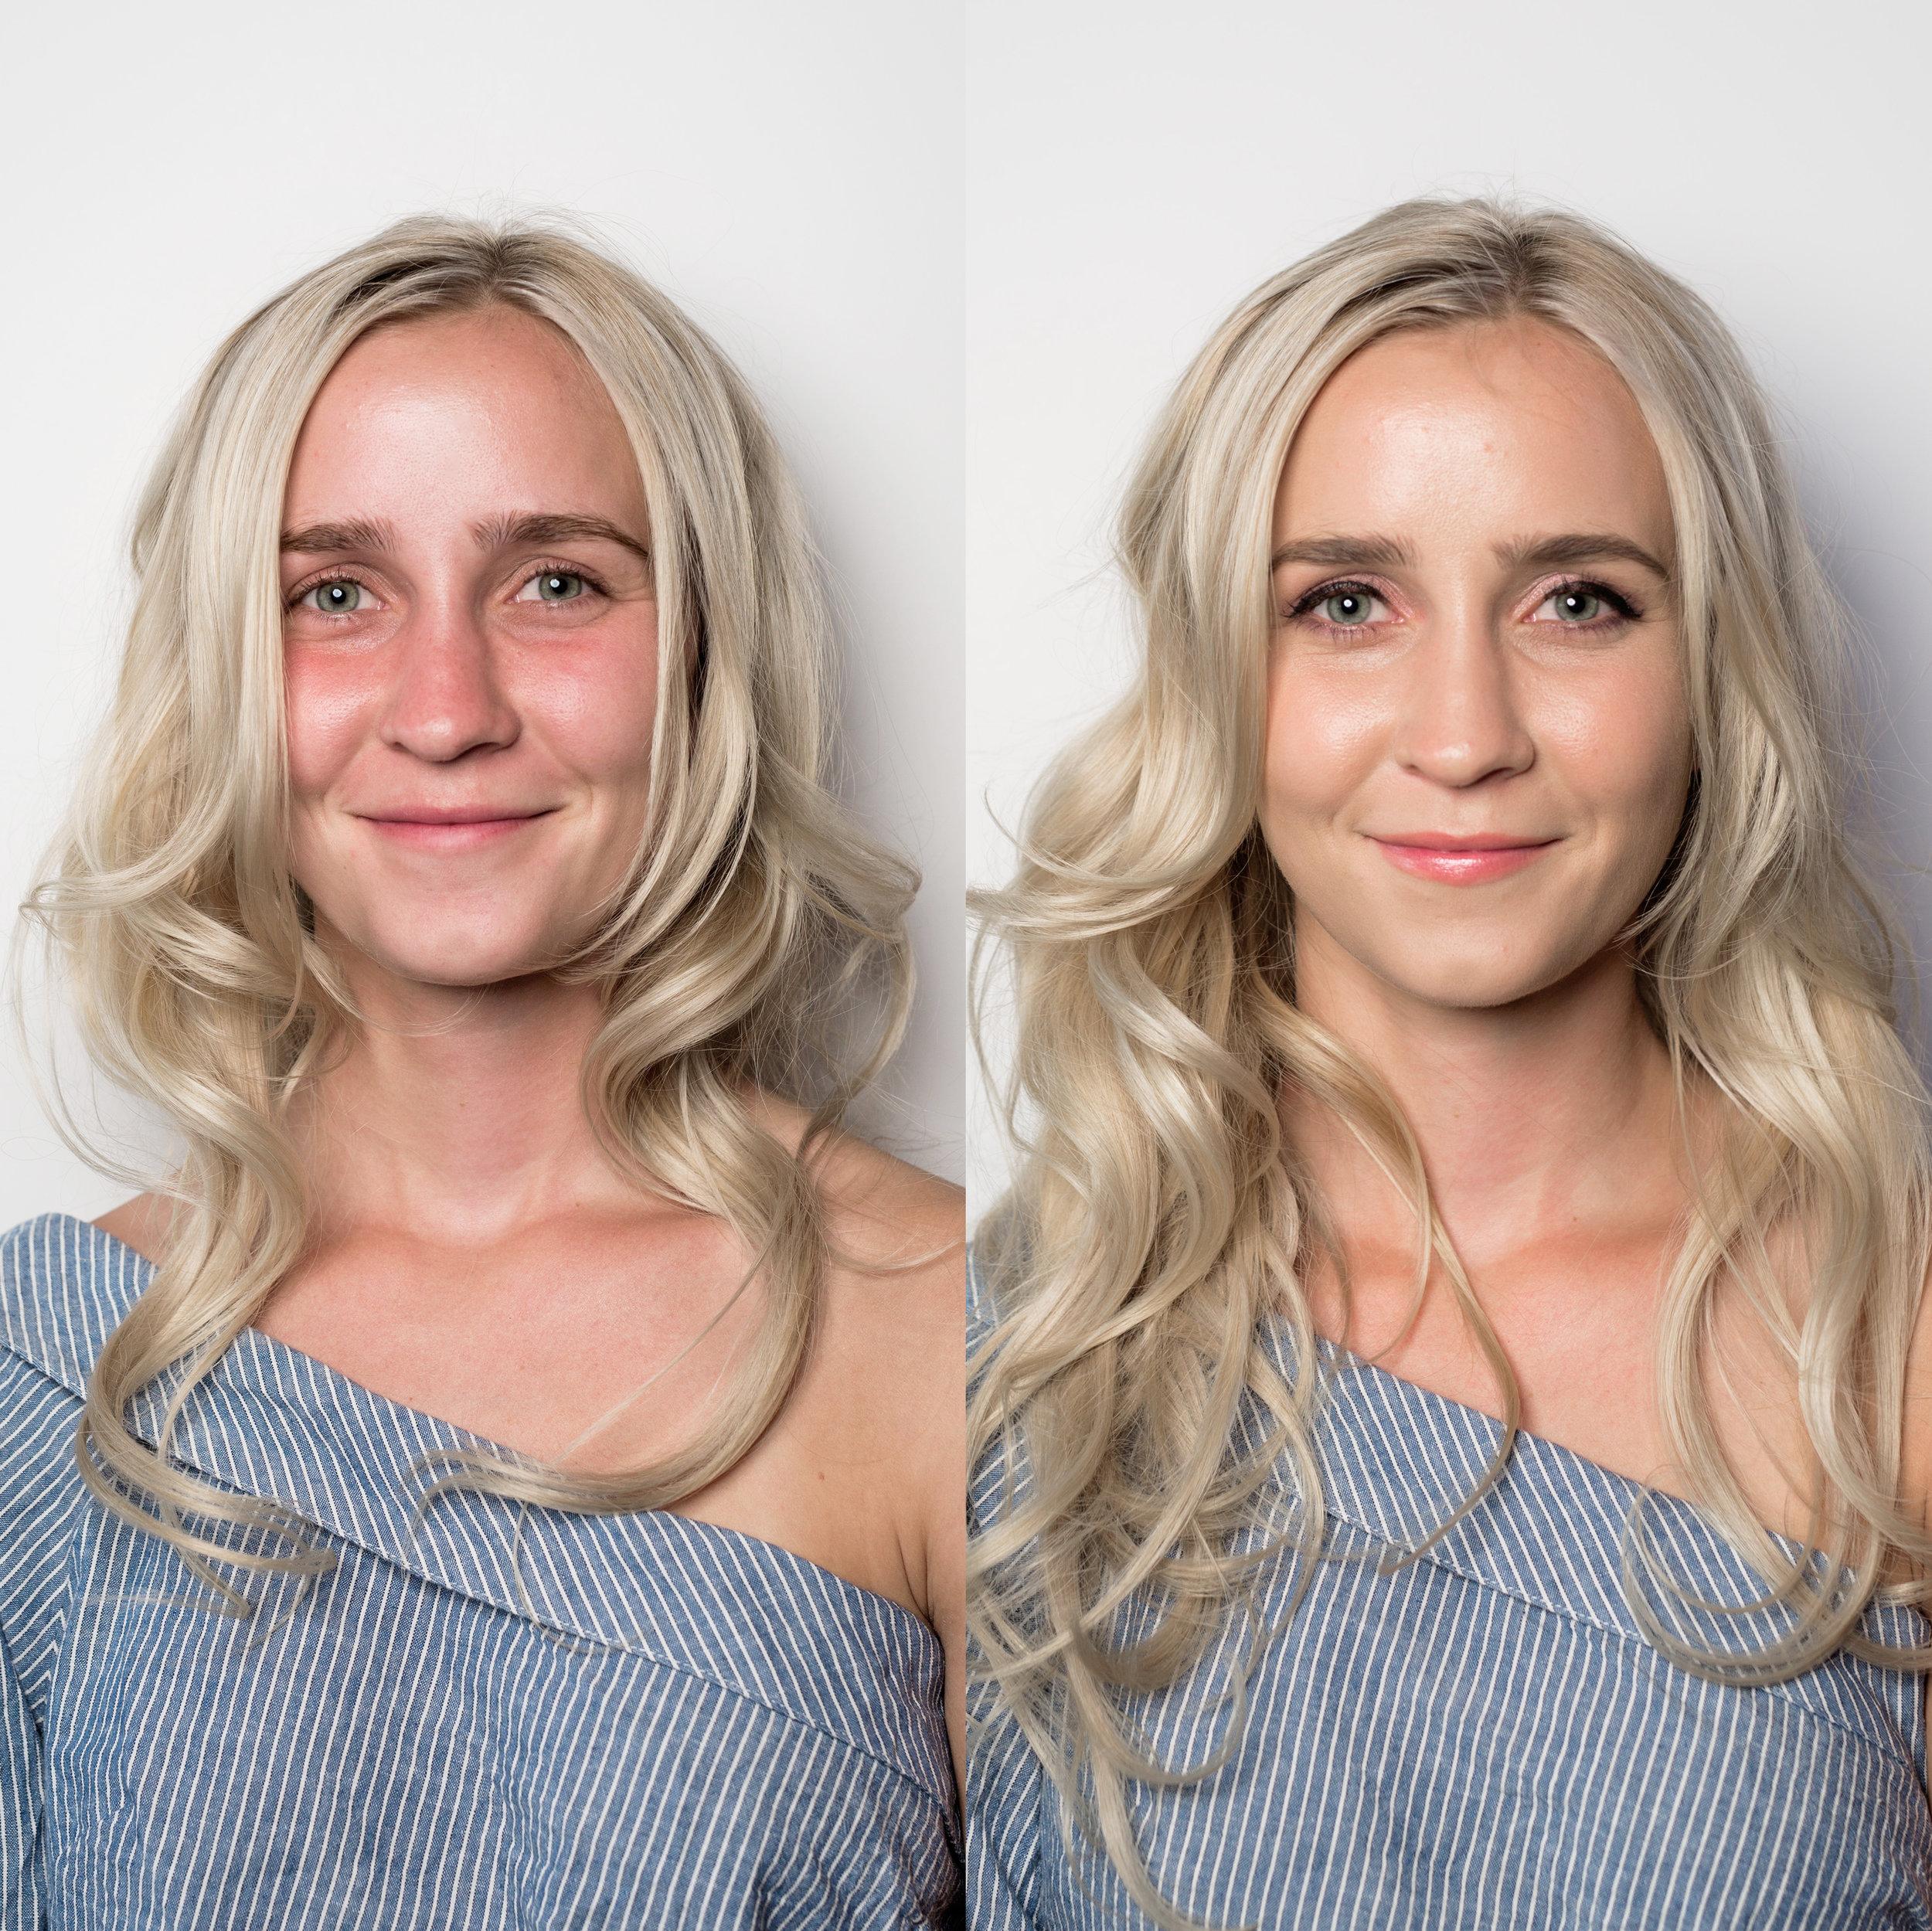 Make-up by Ali